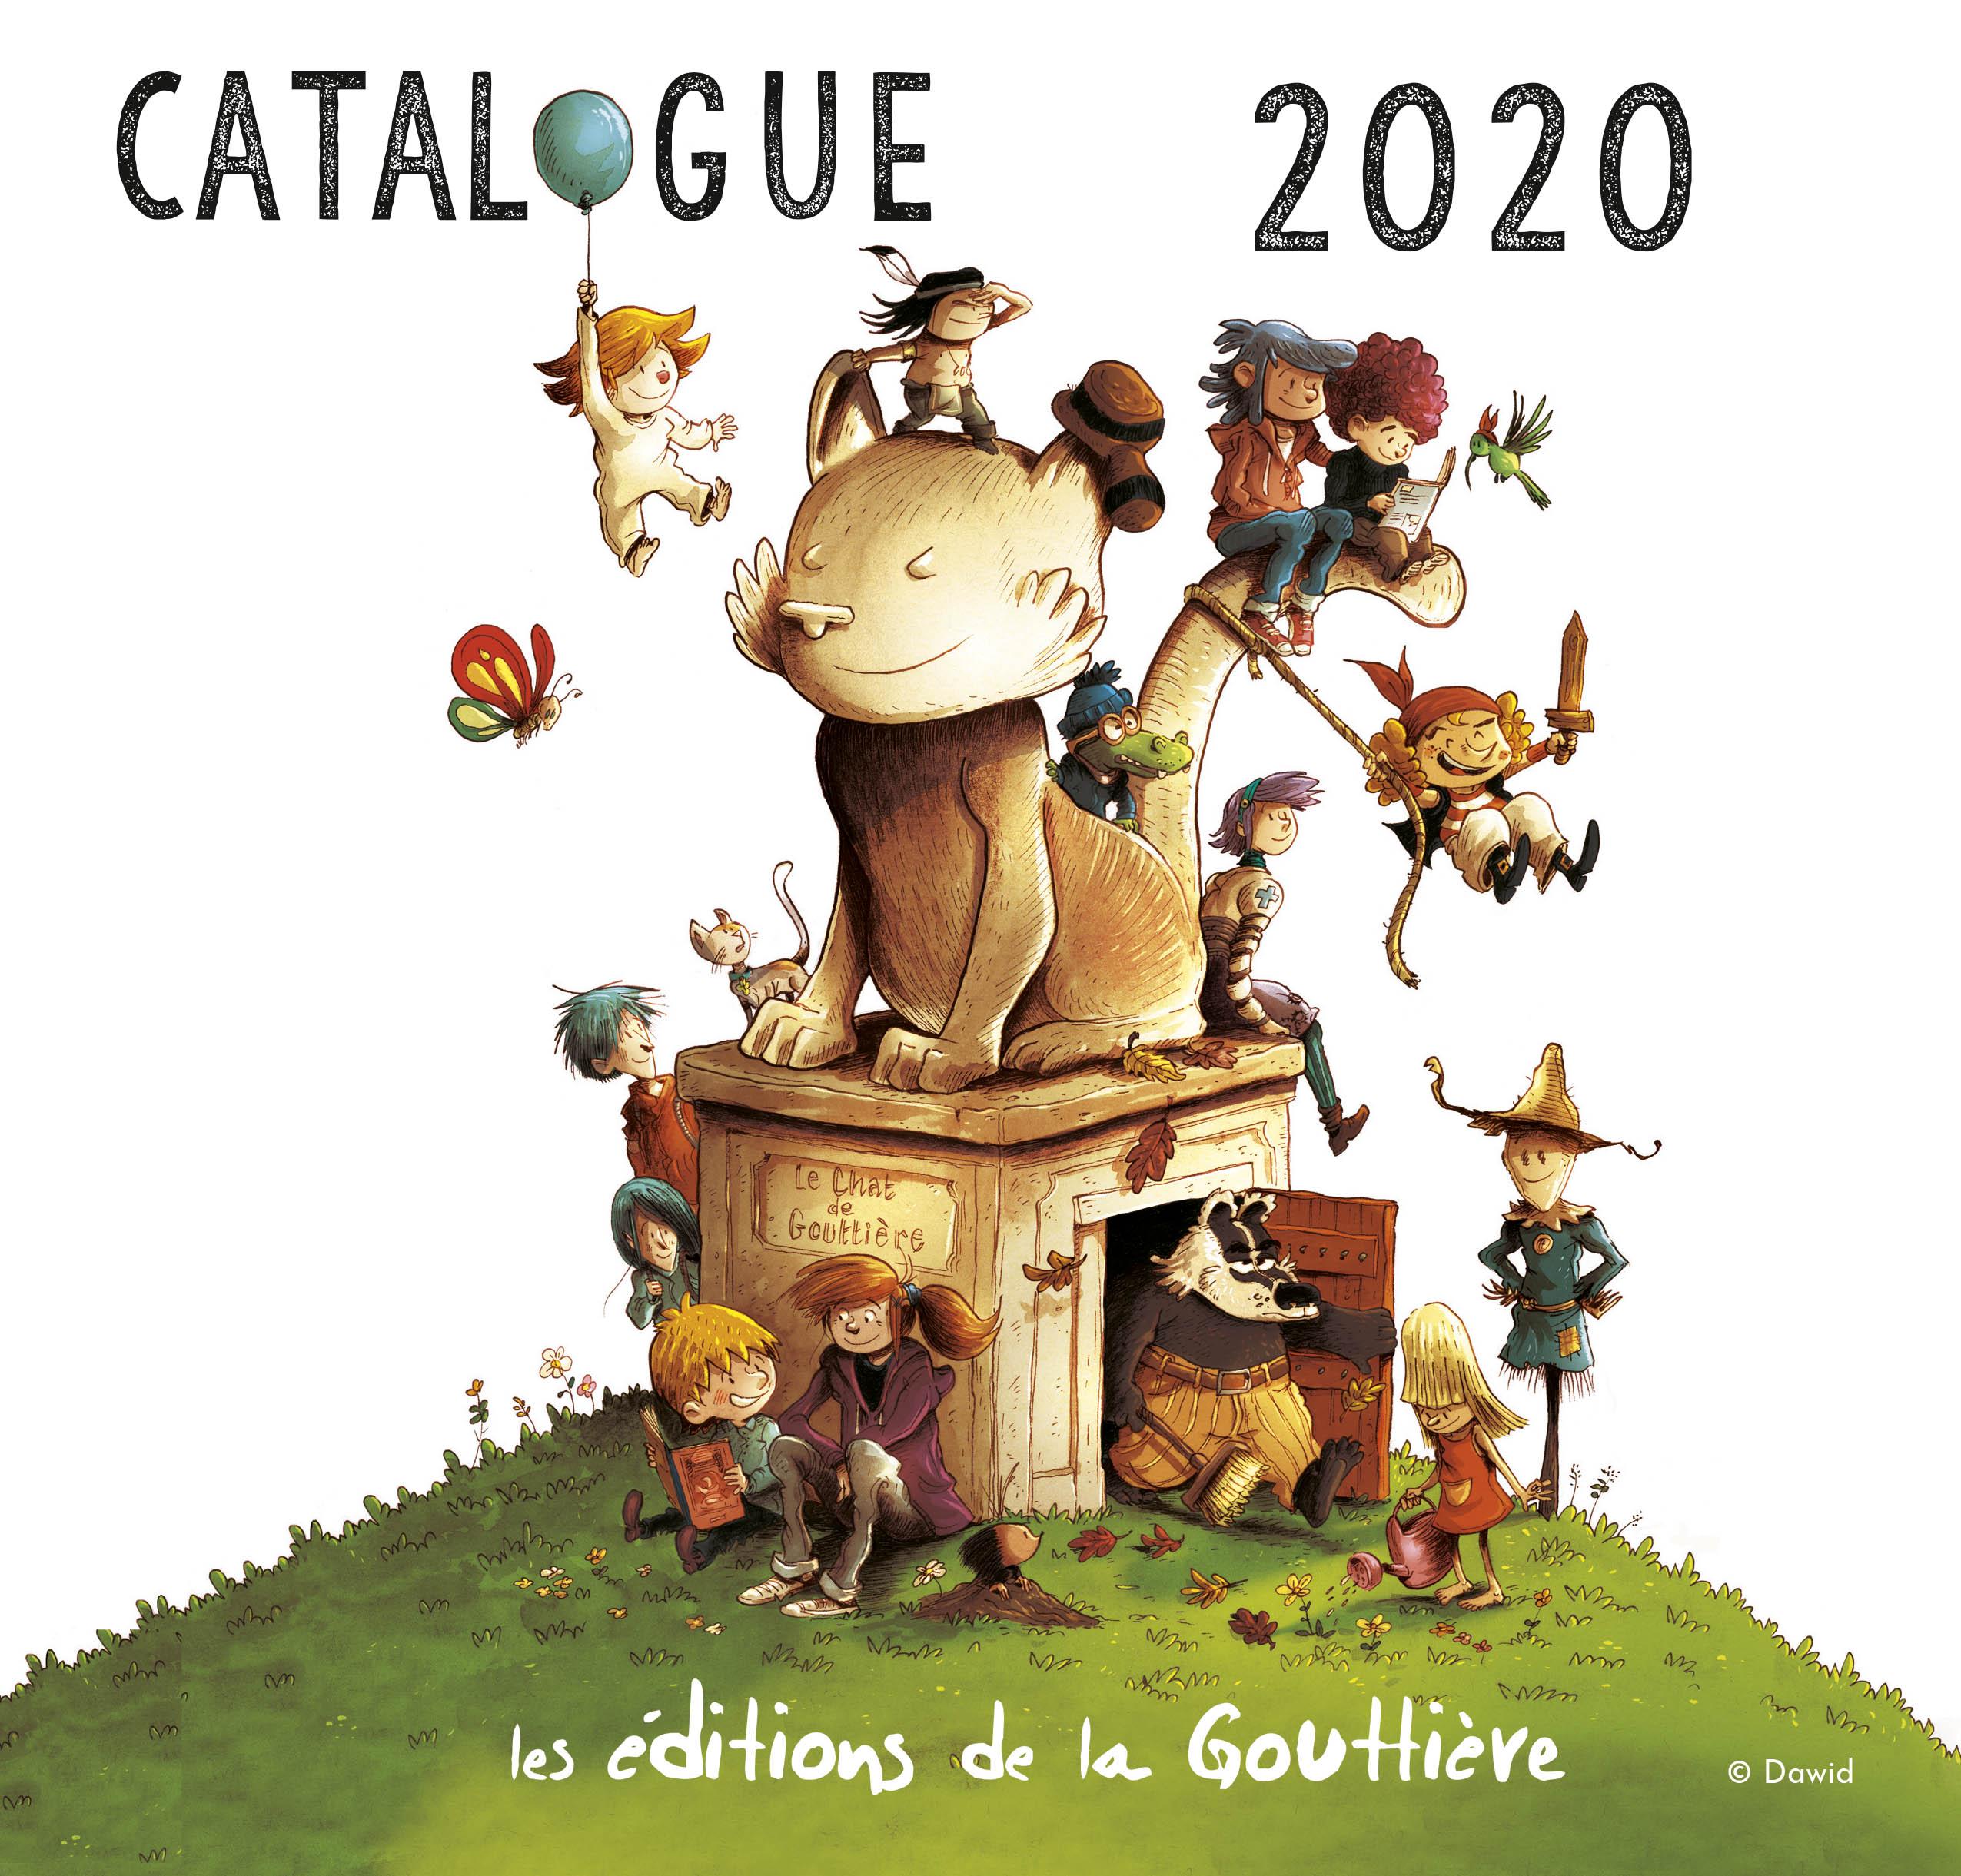 Notre catalogue 2020